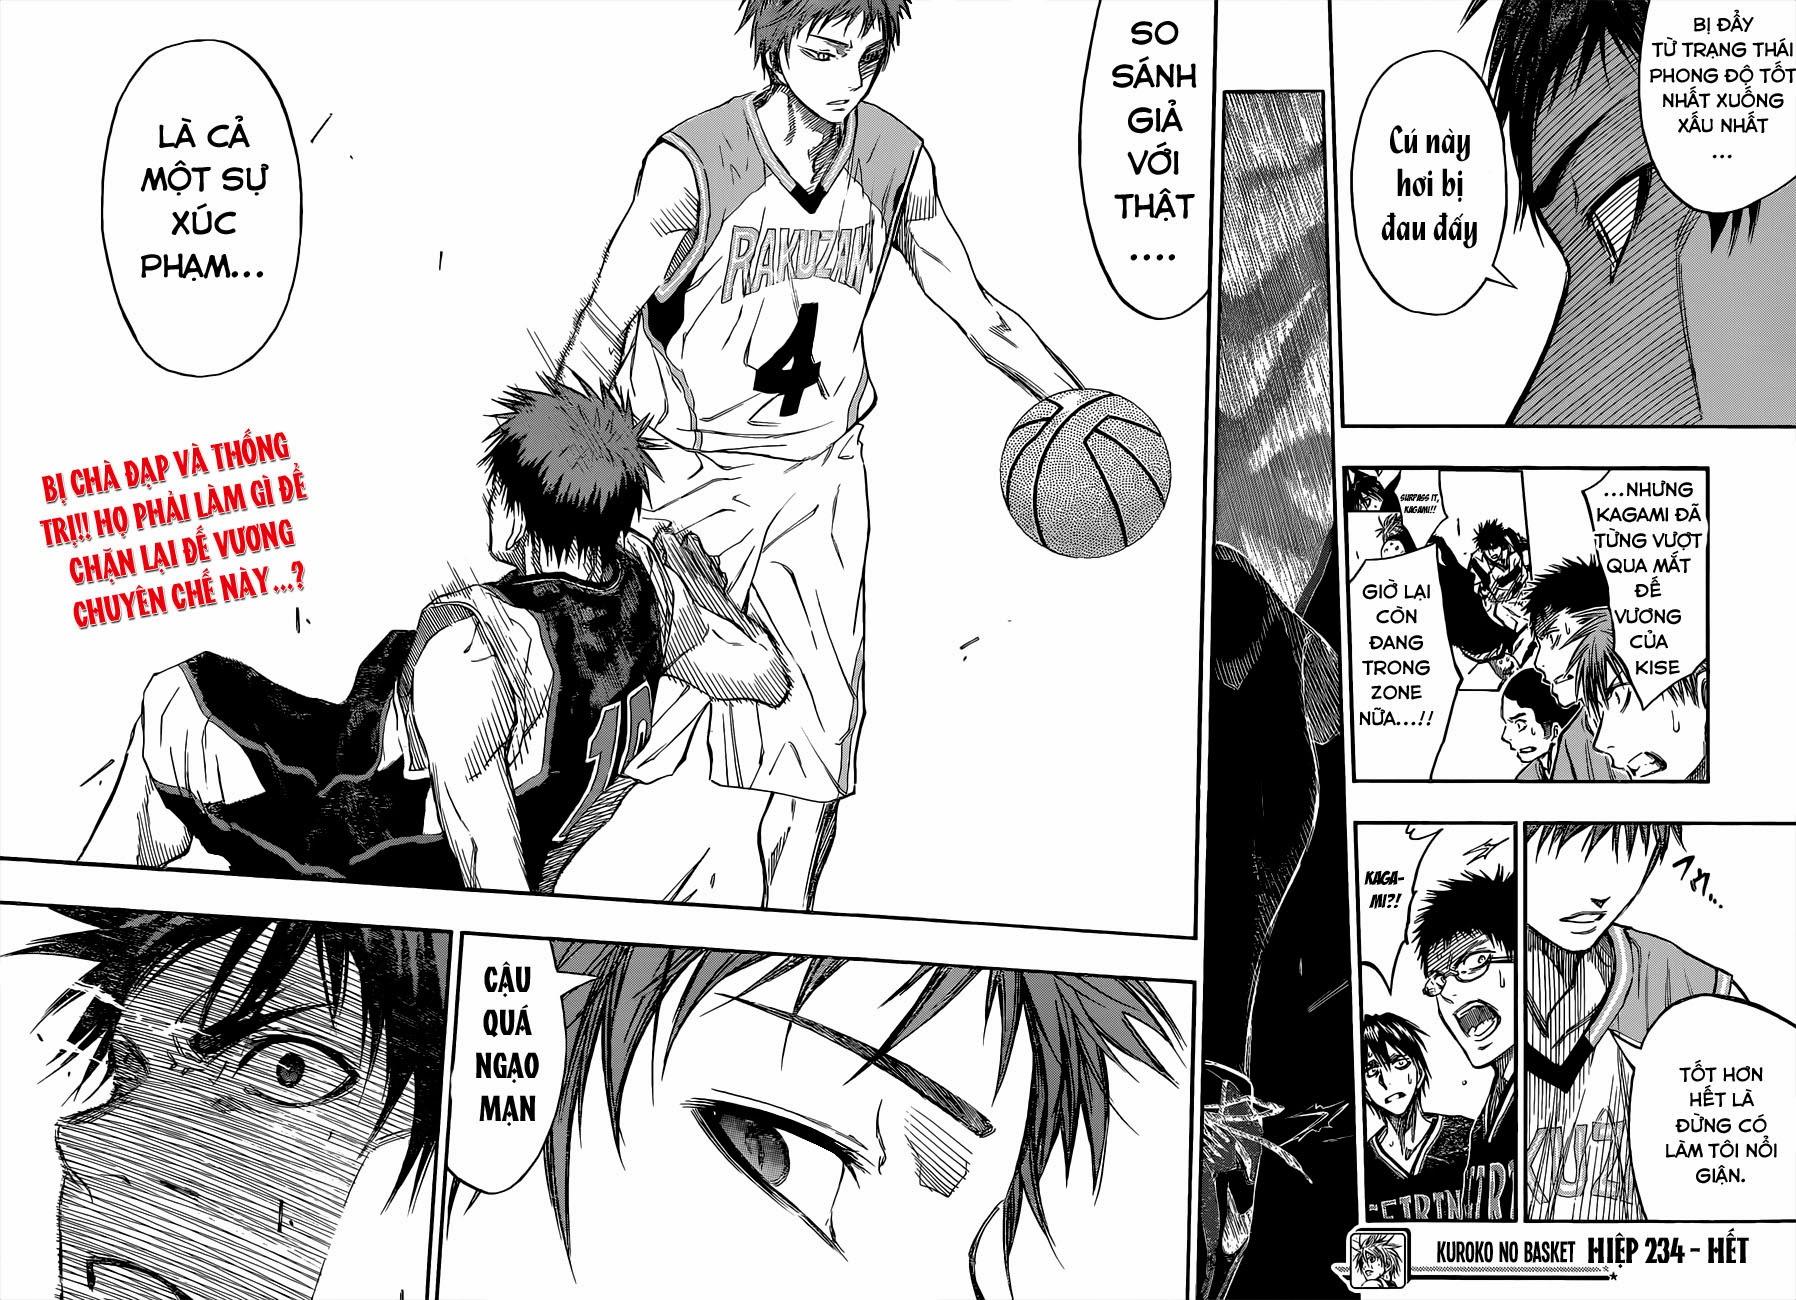 Kuroko No Basket chap 234 trang 21